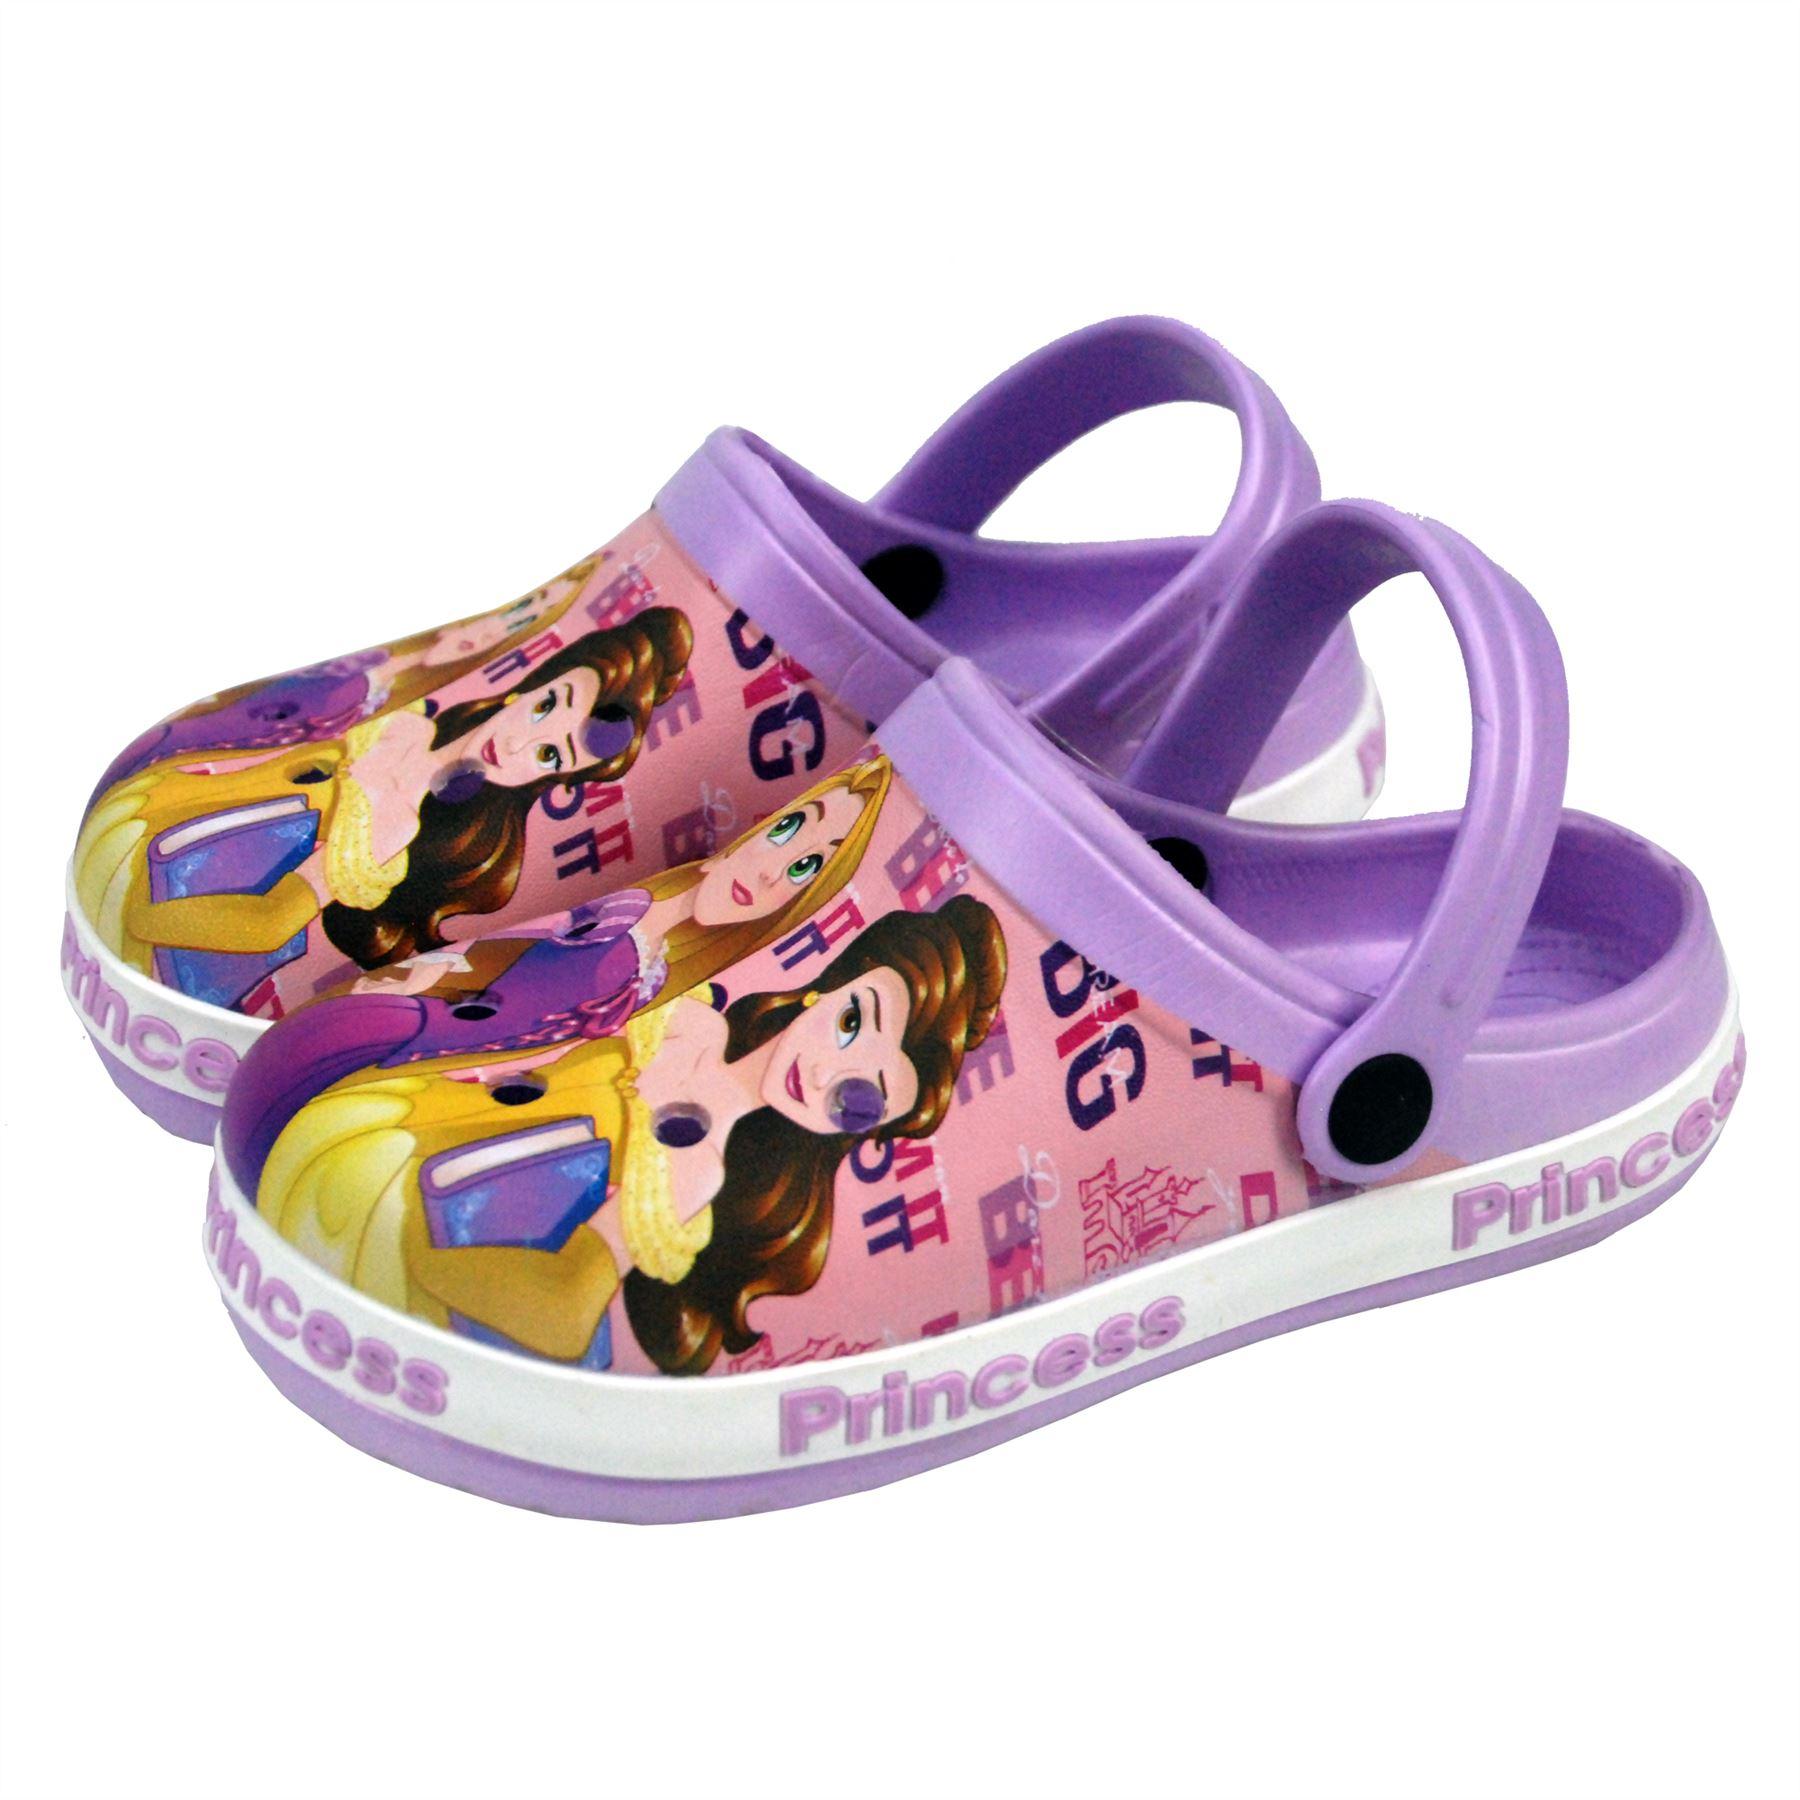 Disney Princes Kids Girls Sandals Beach Slippers Shoes UK Sizes 5